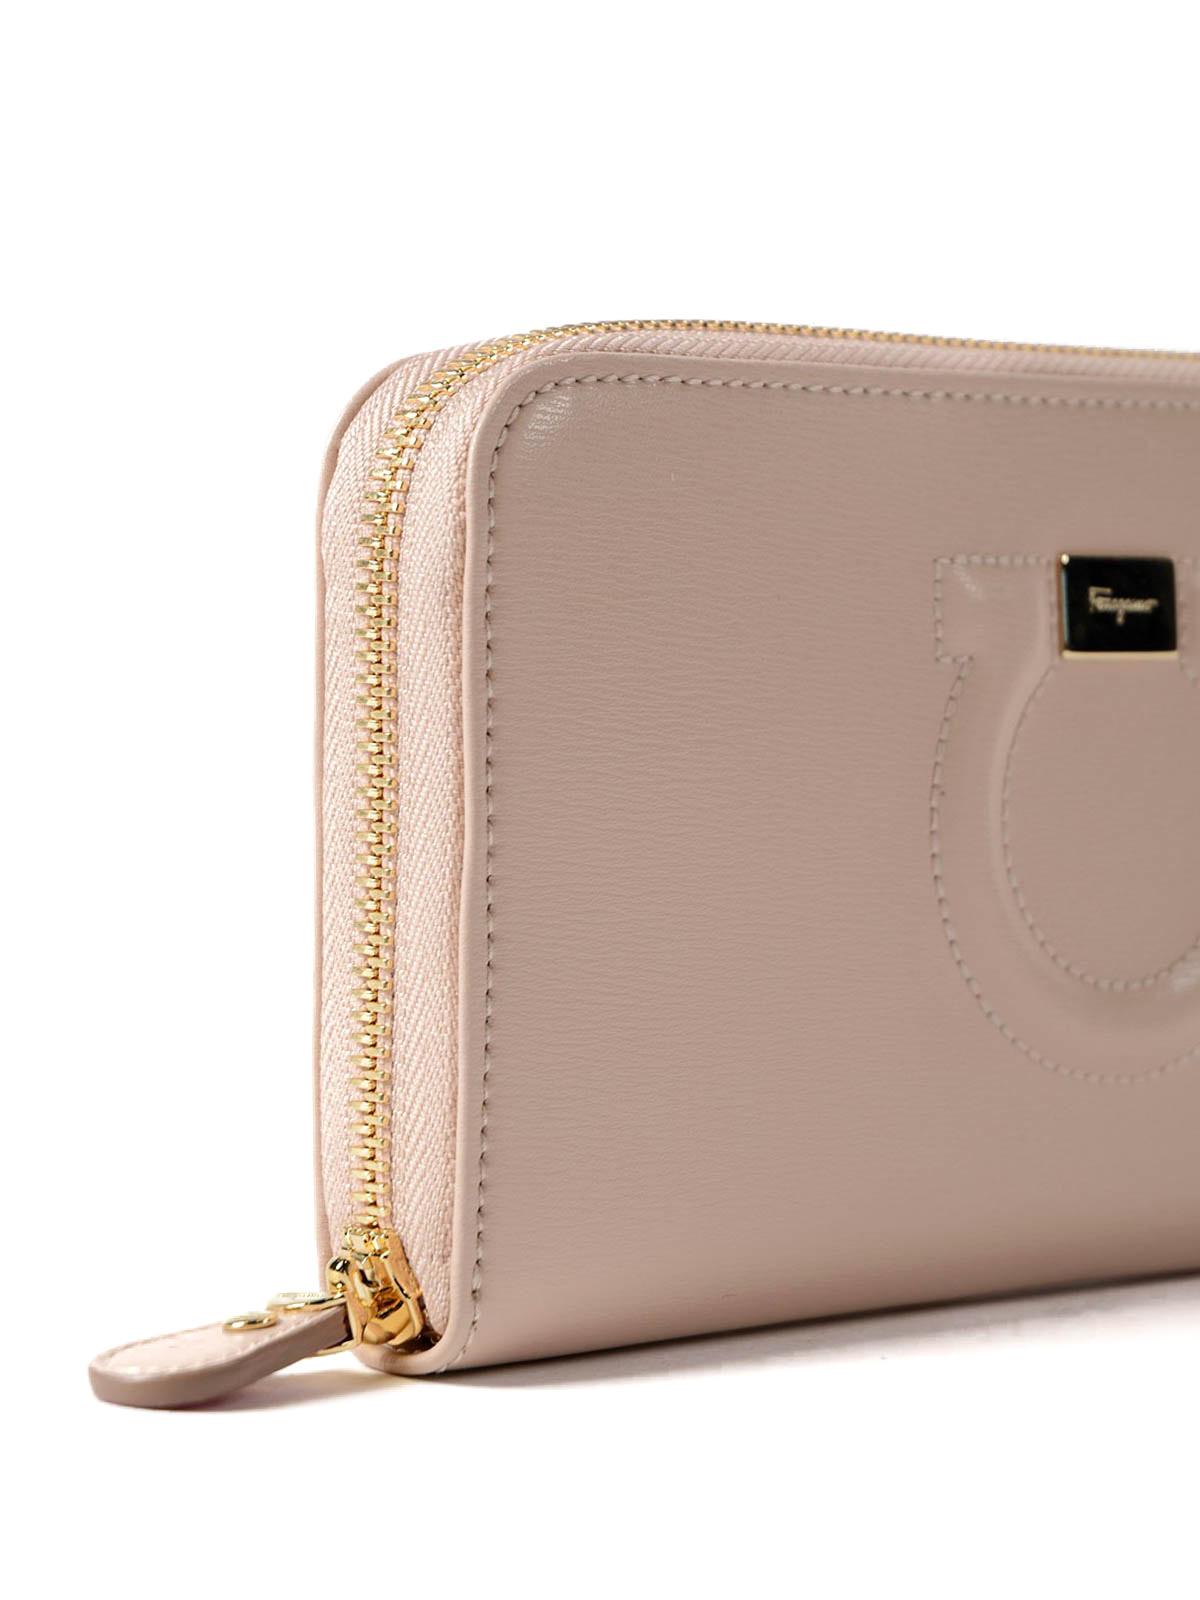 8d23dc9e837e7 Salvatore Ferragamo - Leather Gancini continental wallet - wallets ...